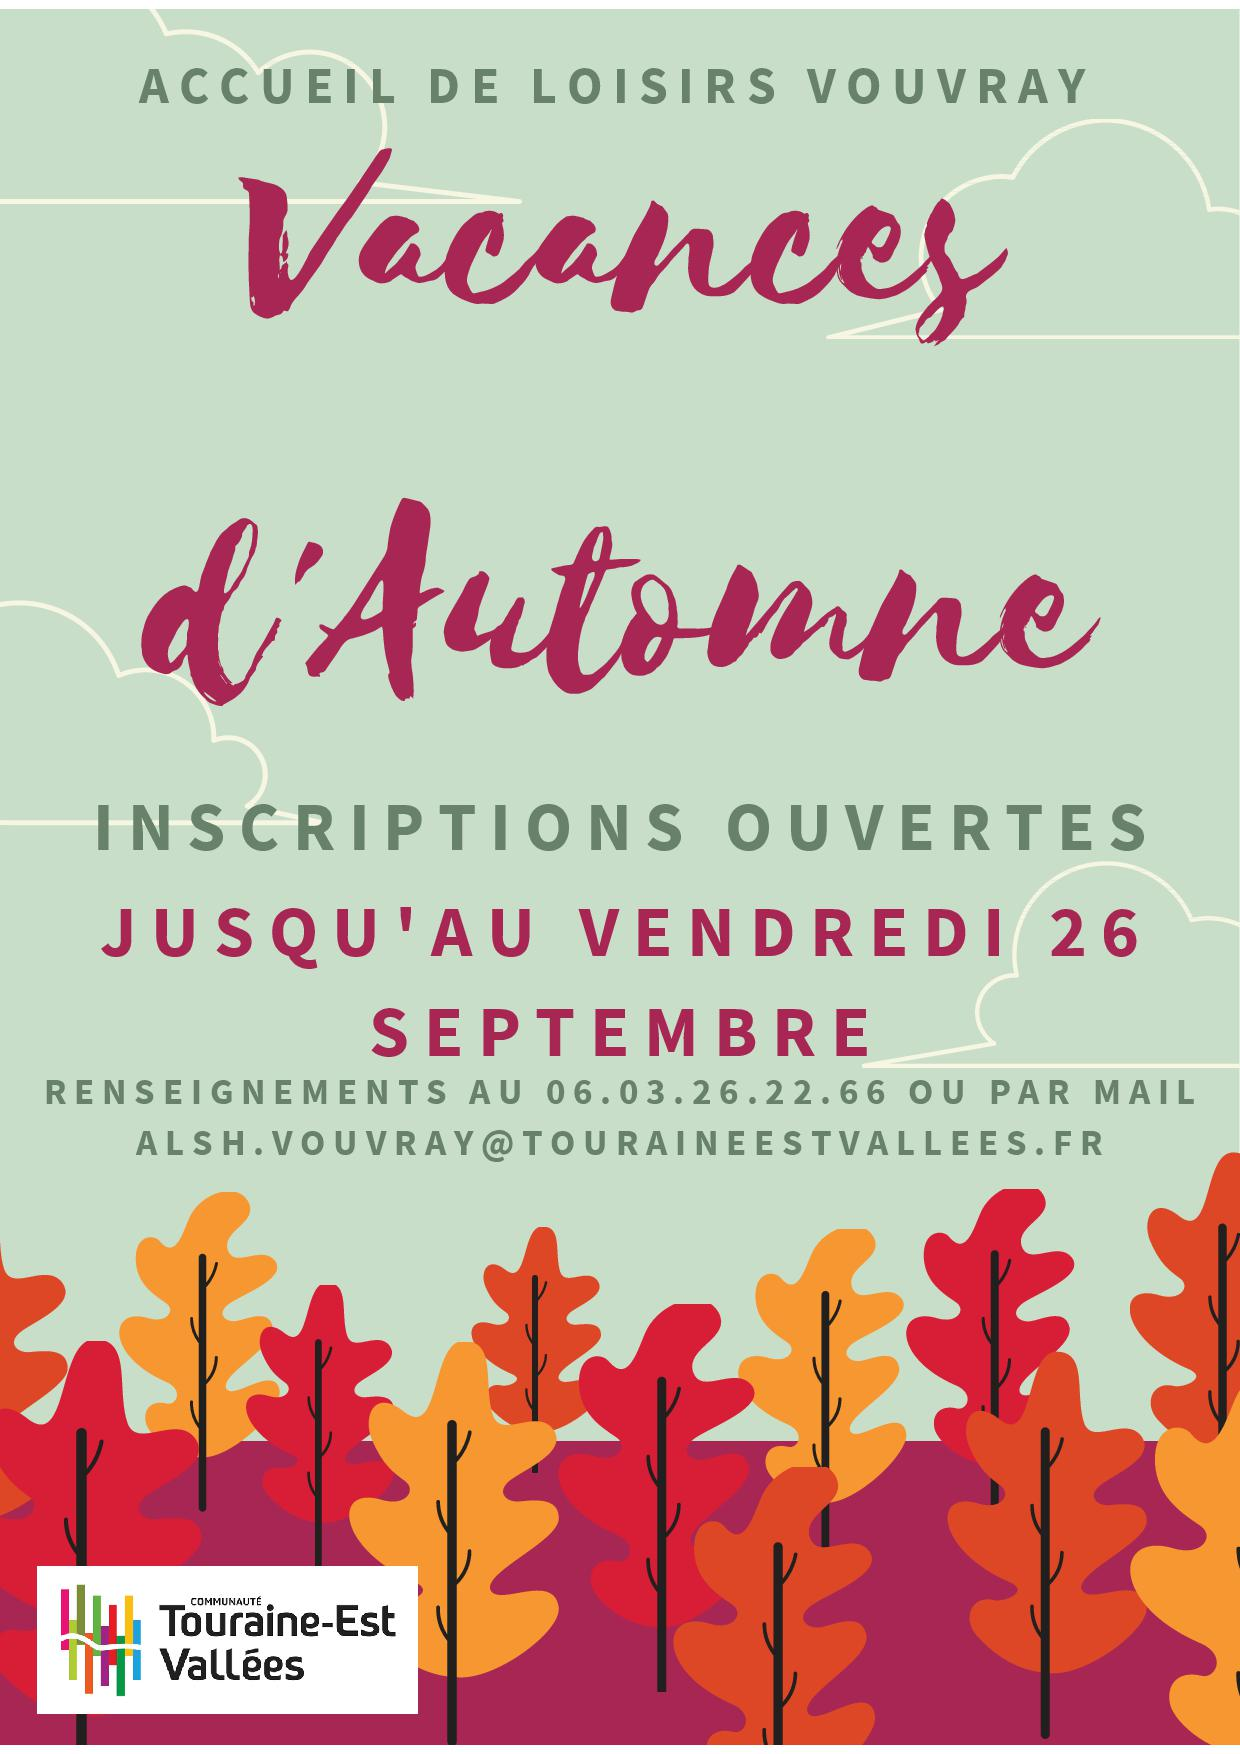 21-08-30-affiche-vacances-automne.jpg